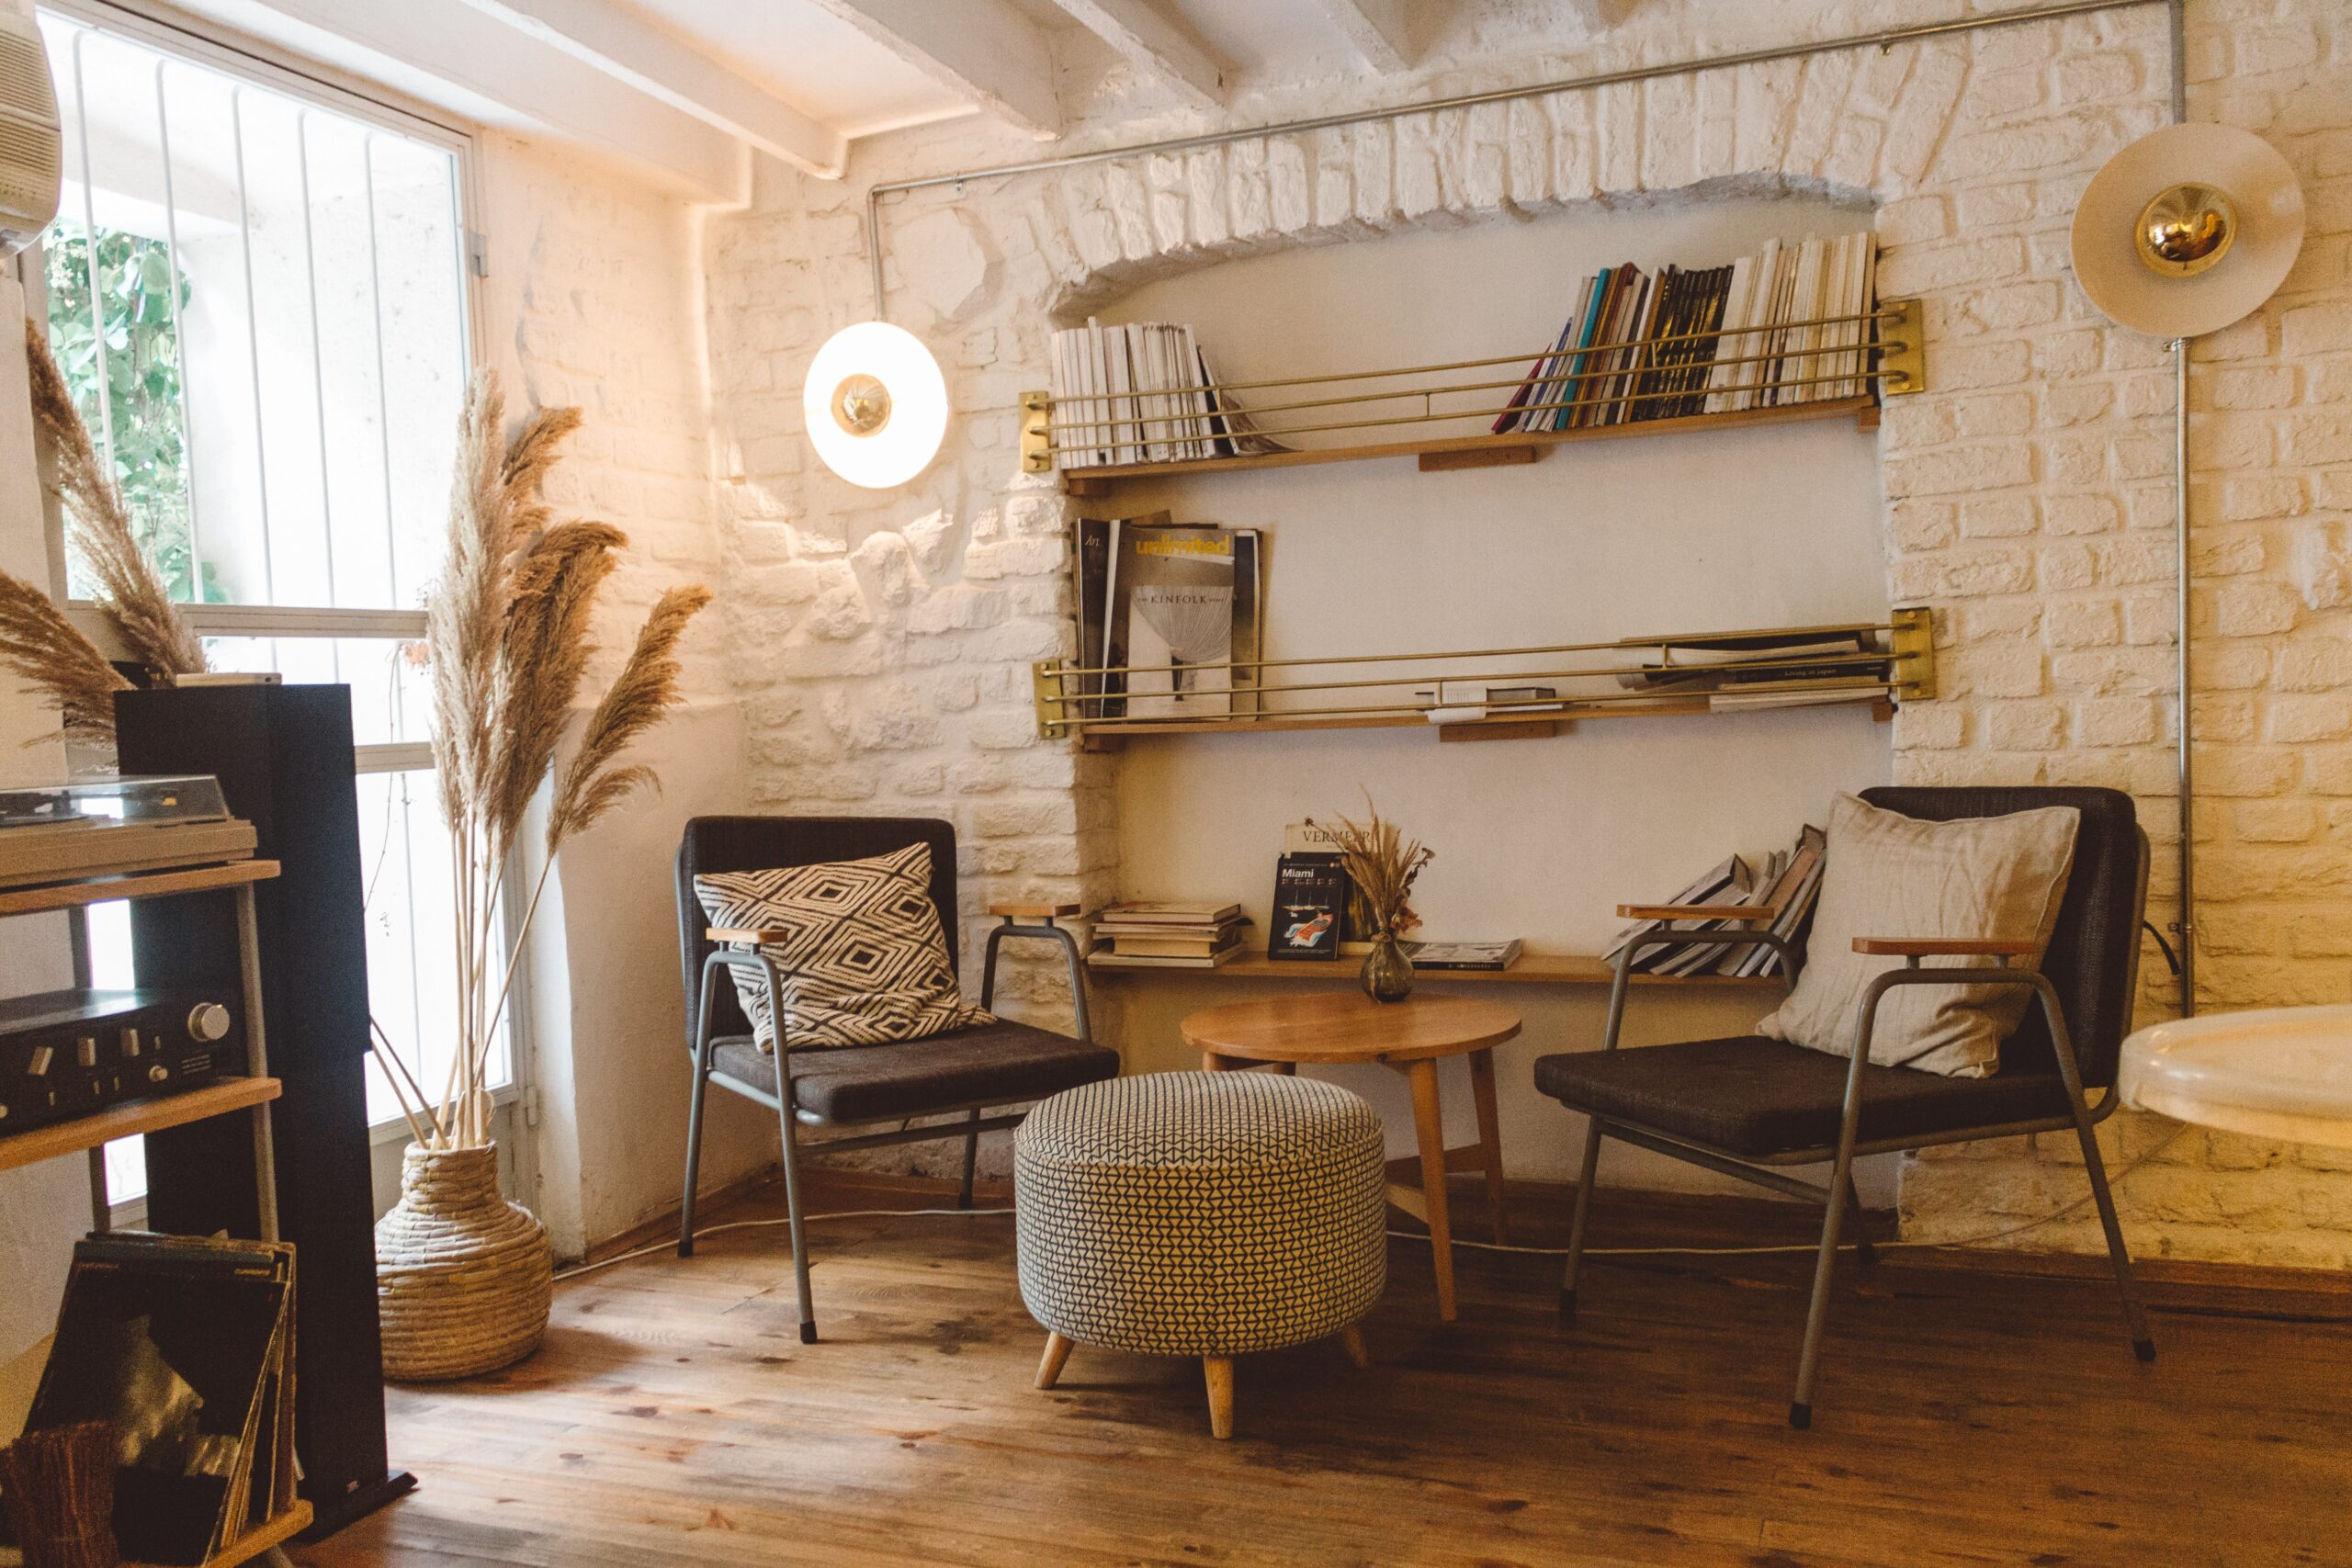 Home Owner Rent a Room Scheme Dublin